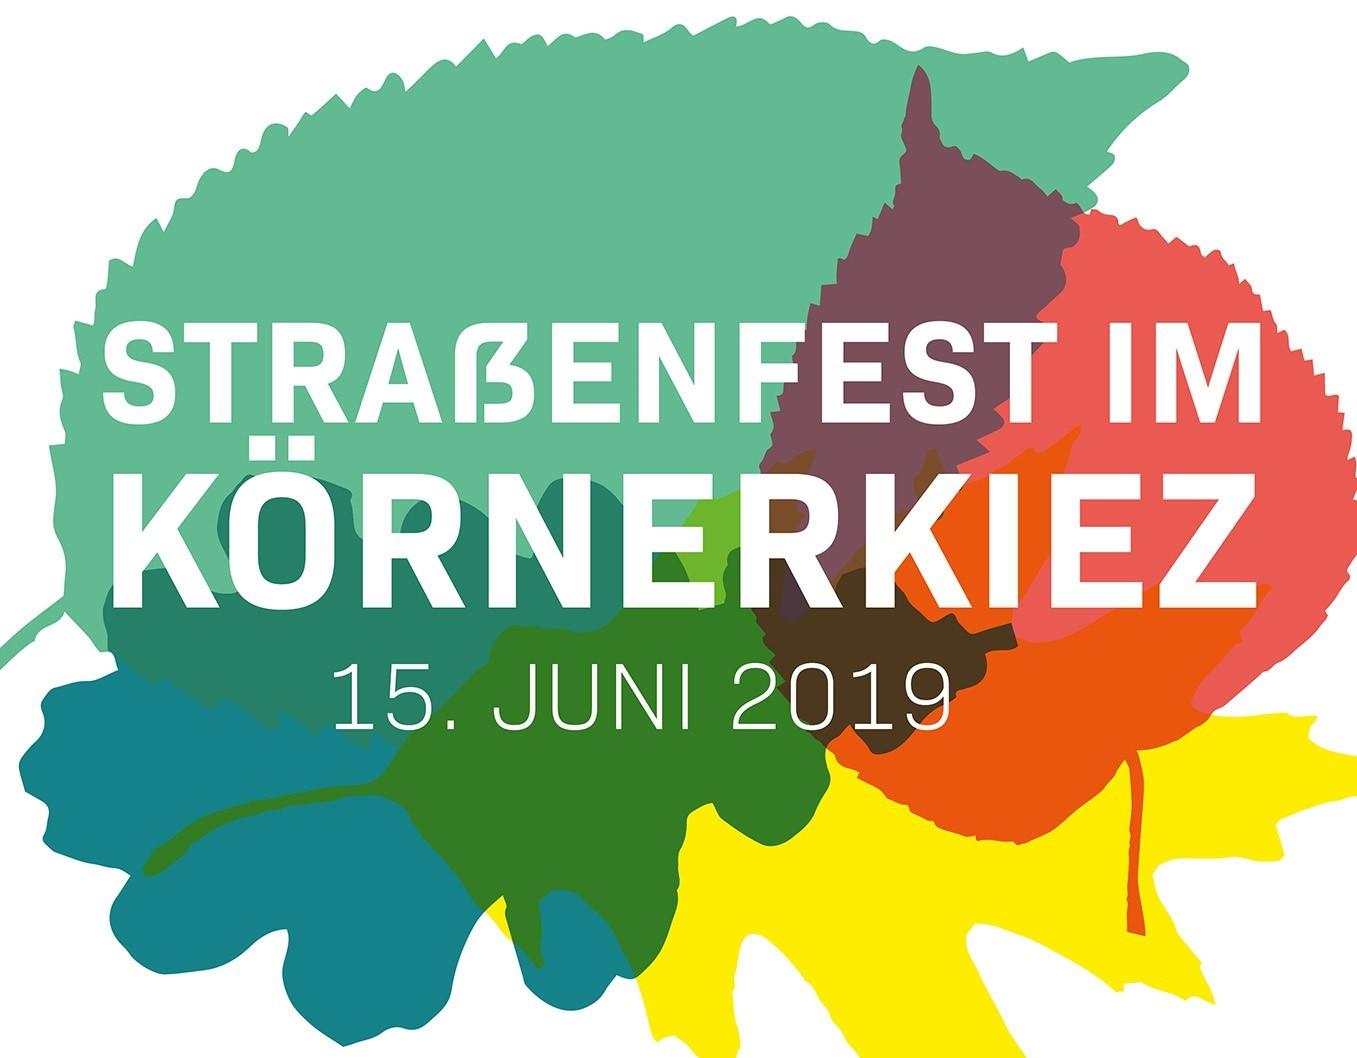 Ausschnitt aus dem Plakat zum 14. Straßenfest im Körnerkiez. Bild: Nachbarschaftsheim Neukölln e.V.